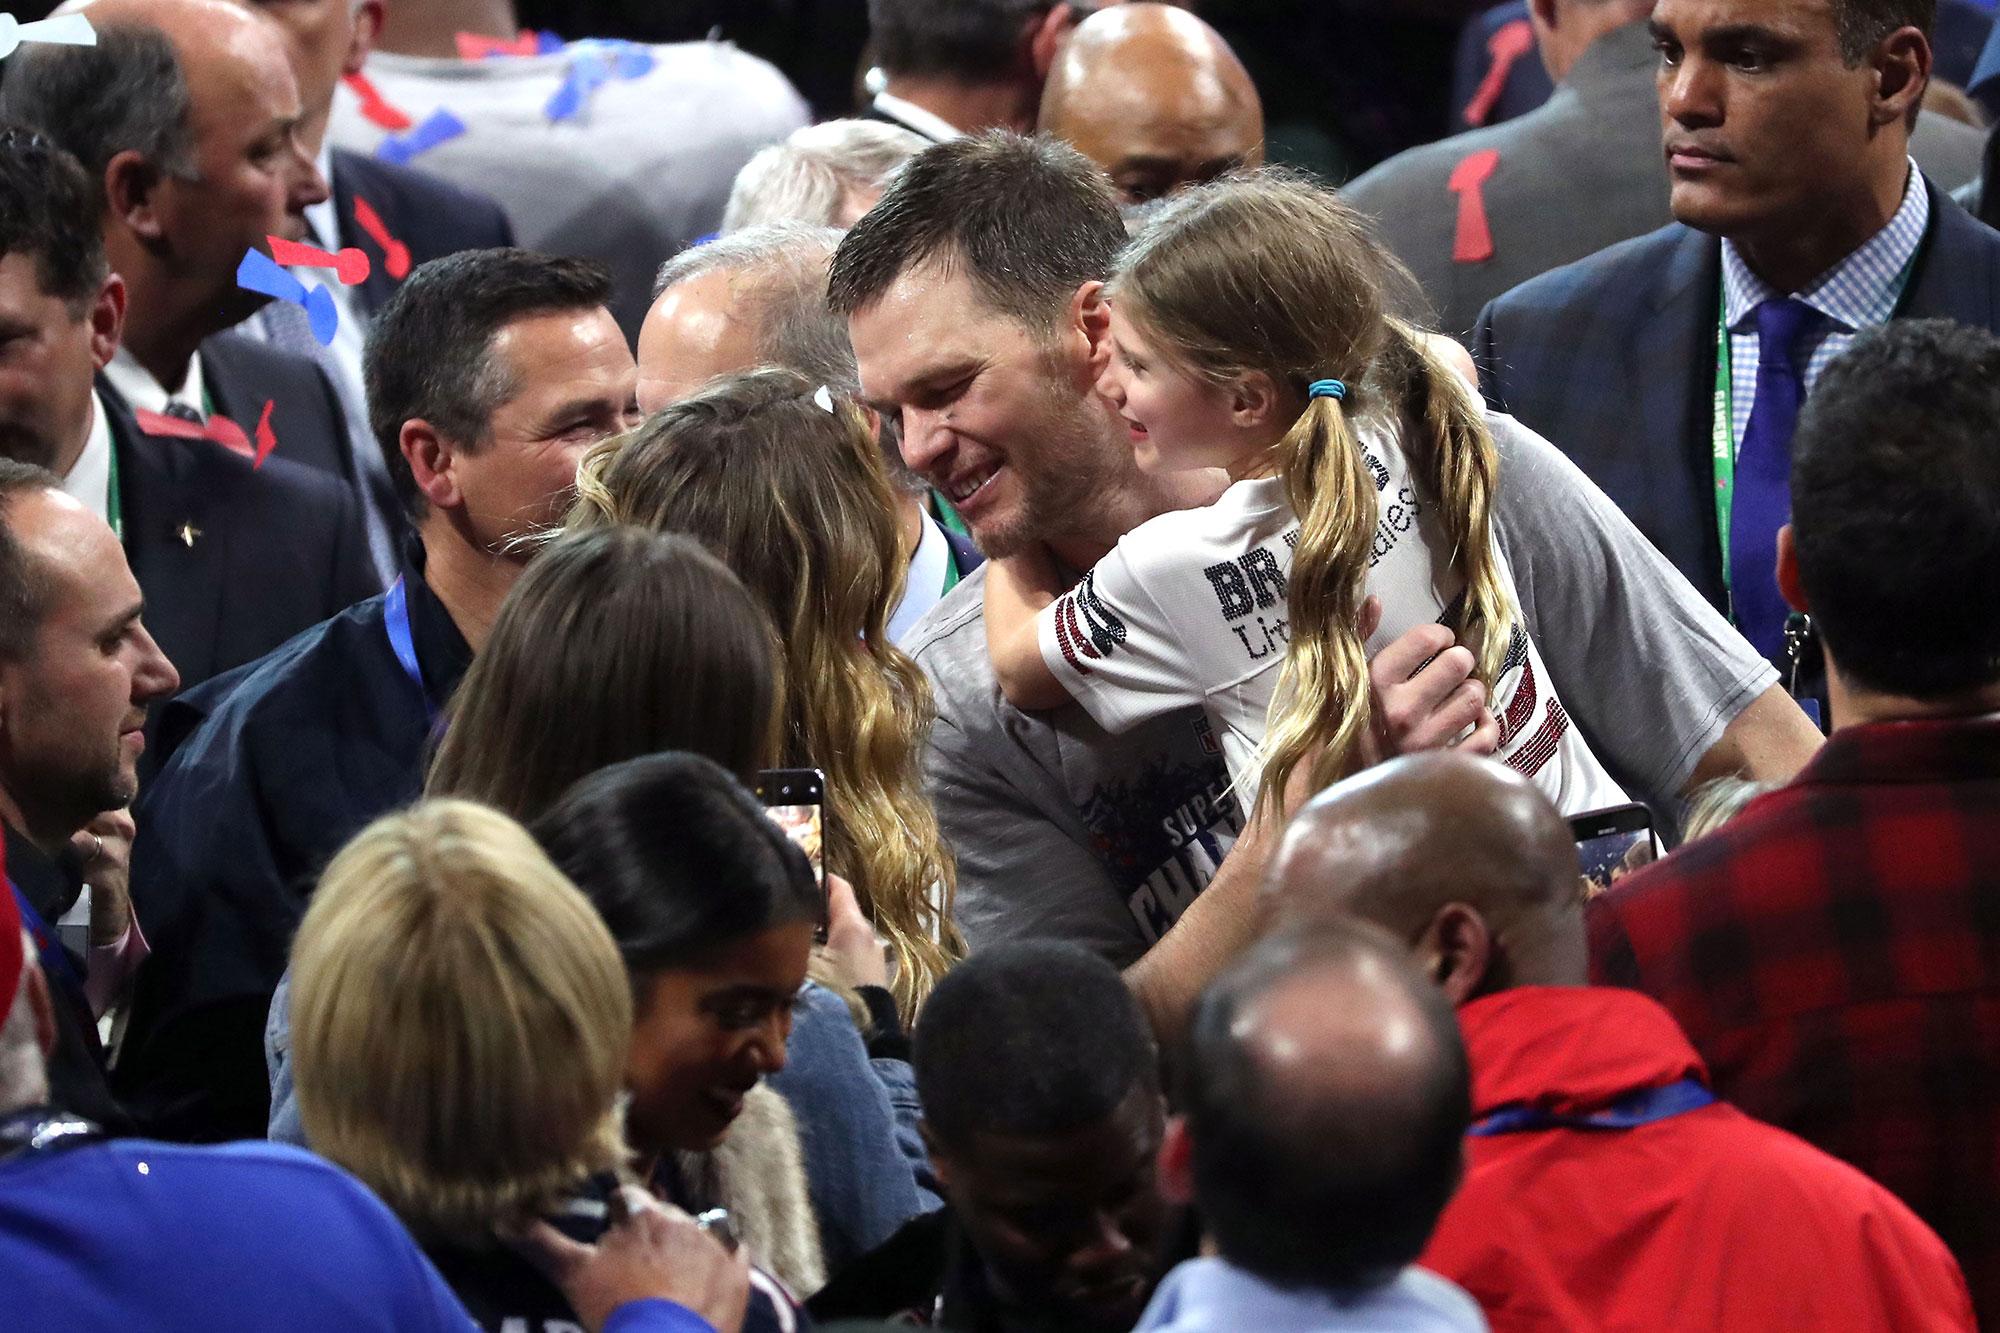 Tom Brady Talks Gisele Bundchen, Kids After Super Bowl 2019 Win